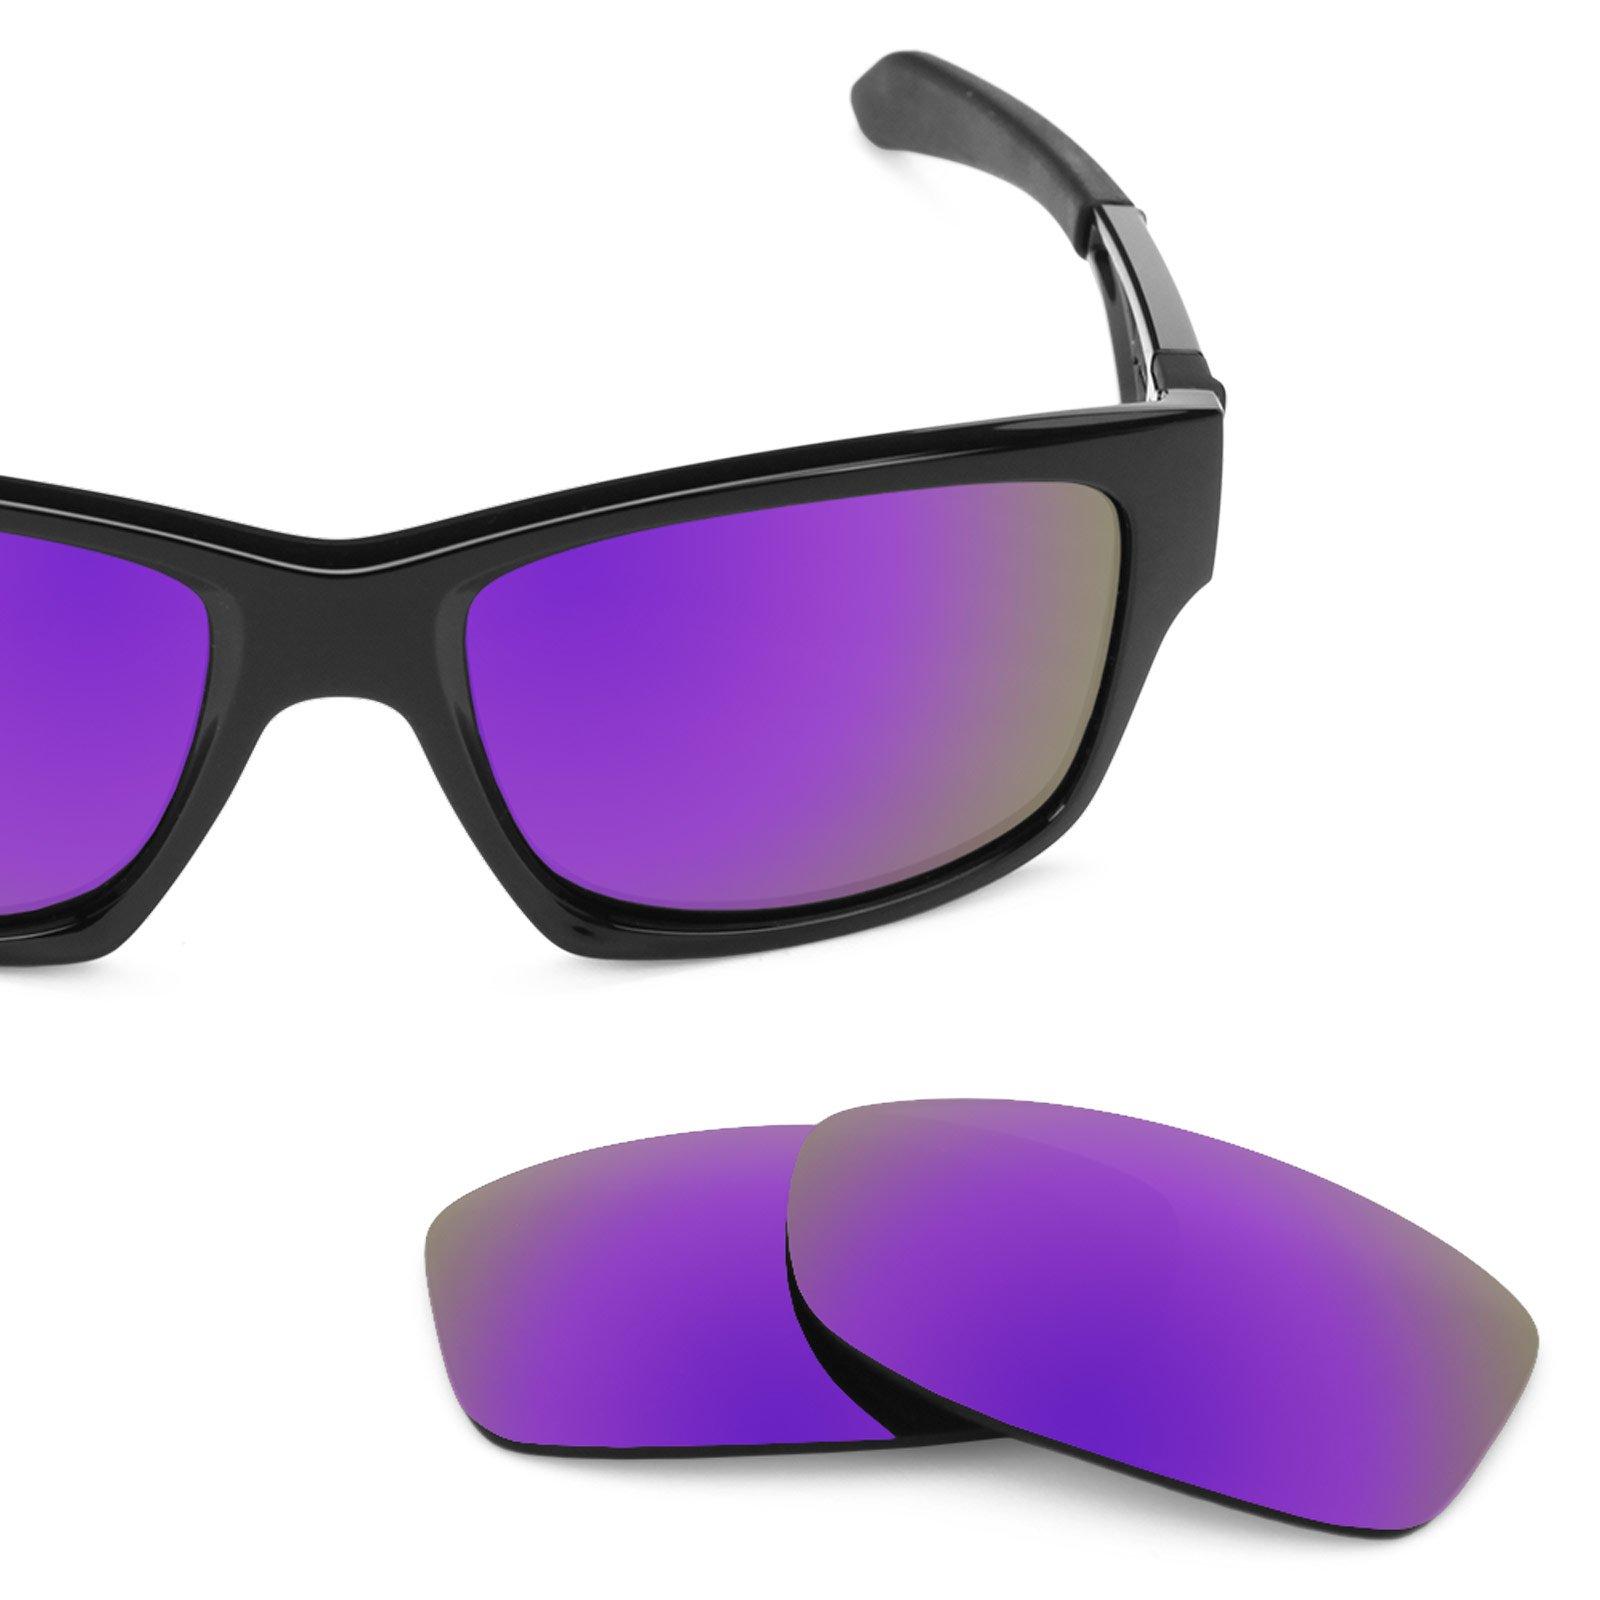 Revant Polarized Replacement Lenses for Oakley Jupiter Squared Plasma Purple MirrorShield by Revant